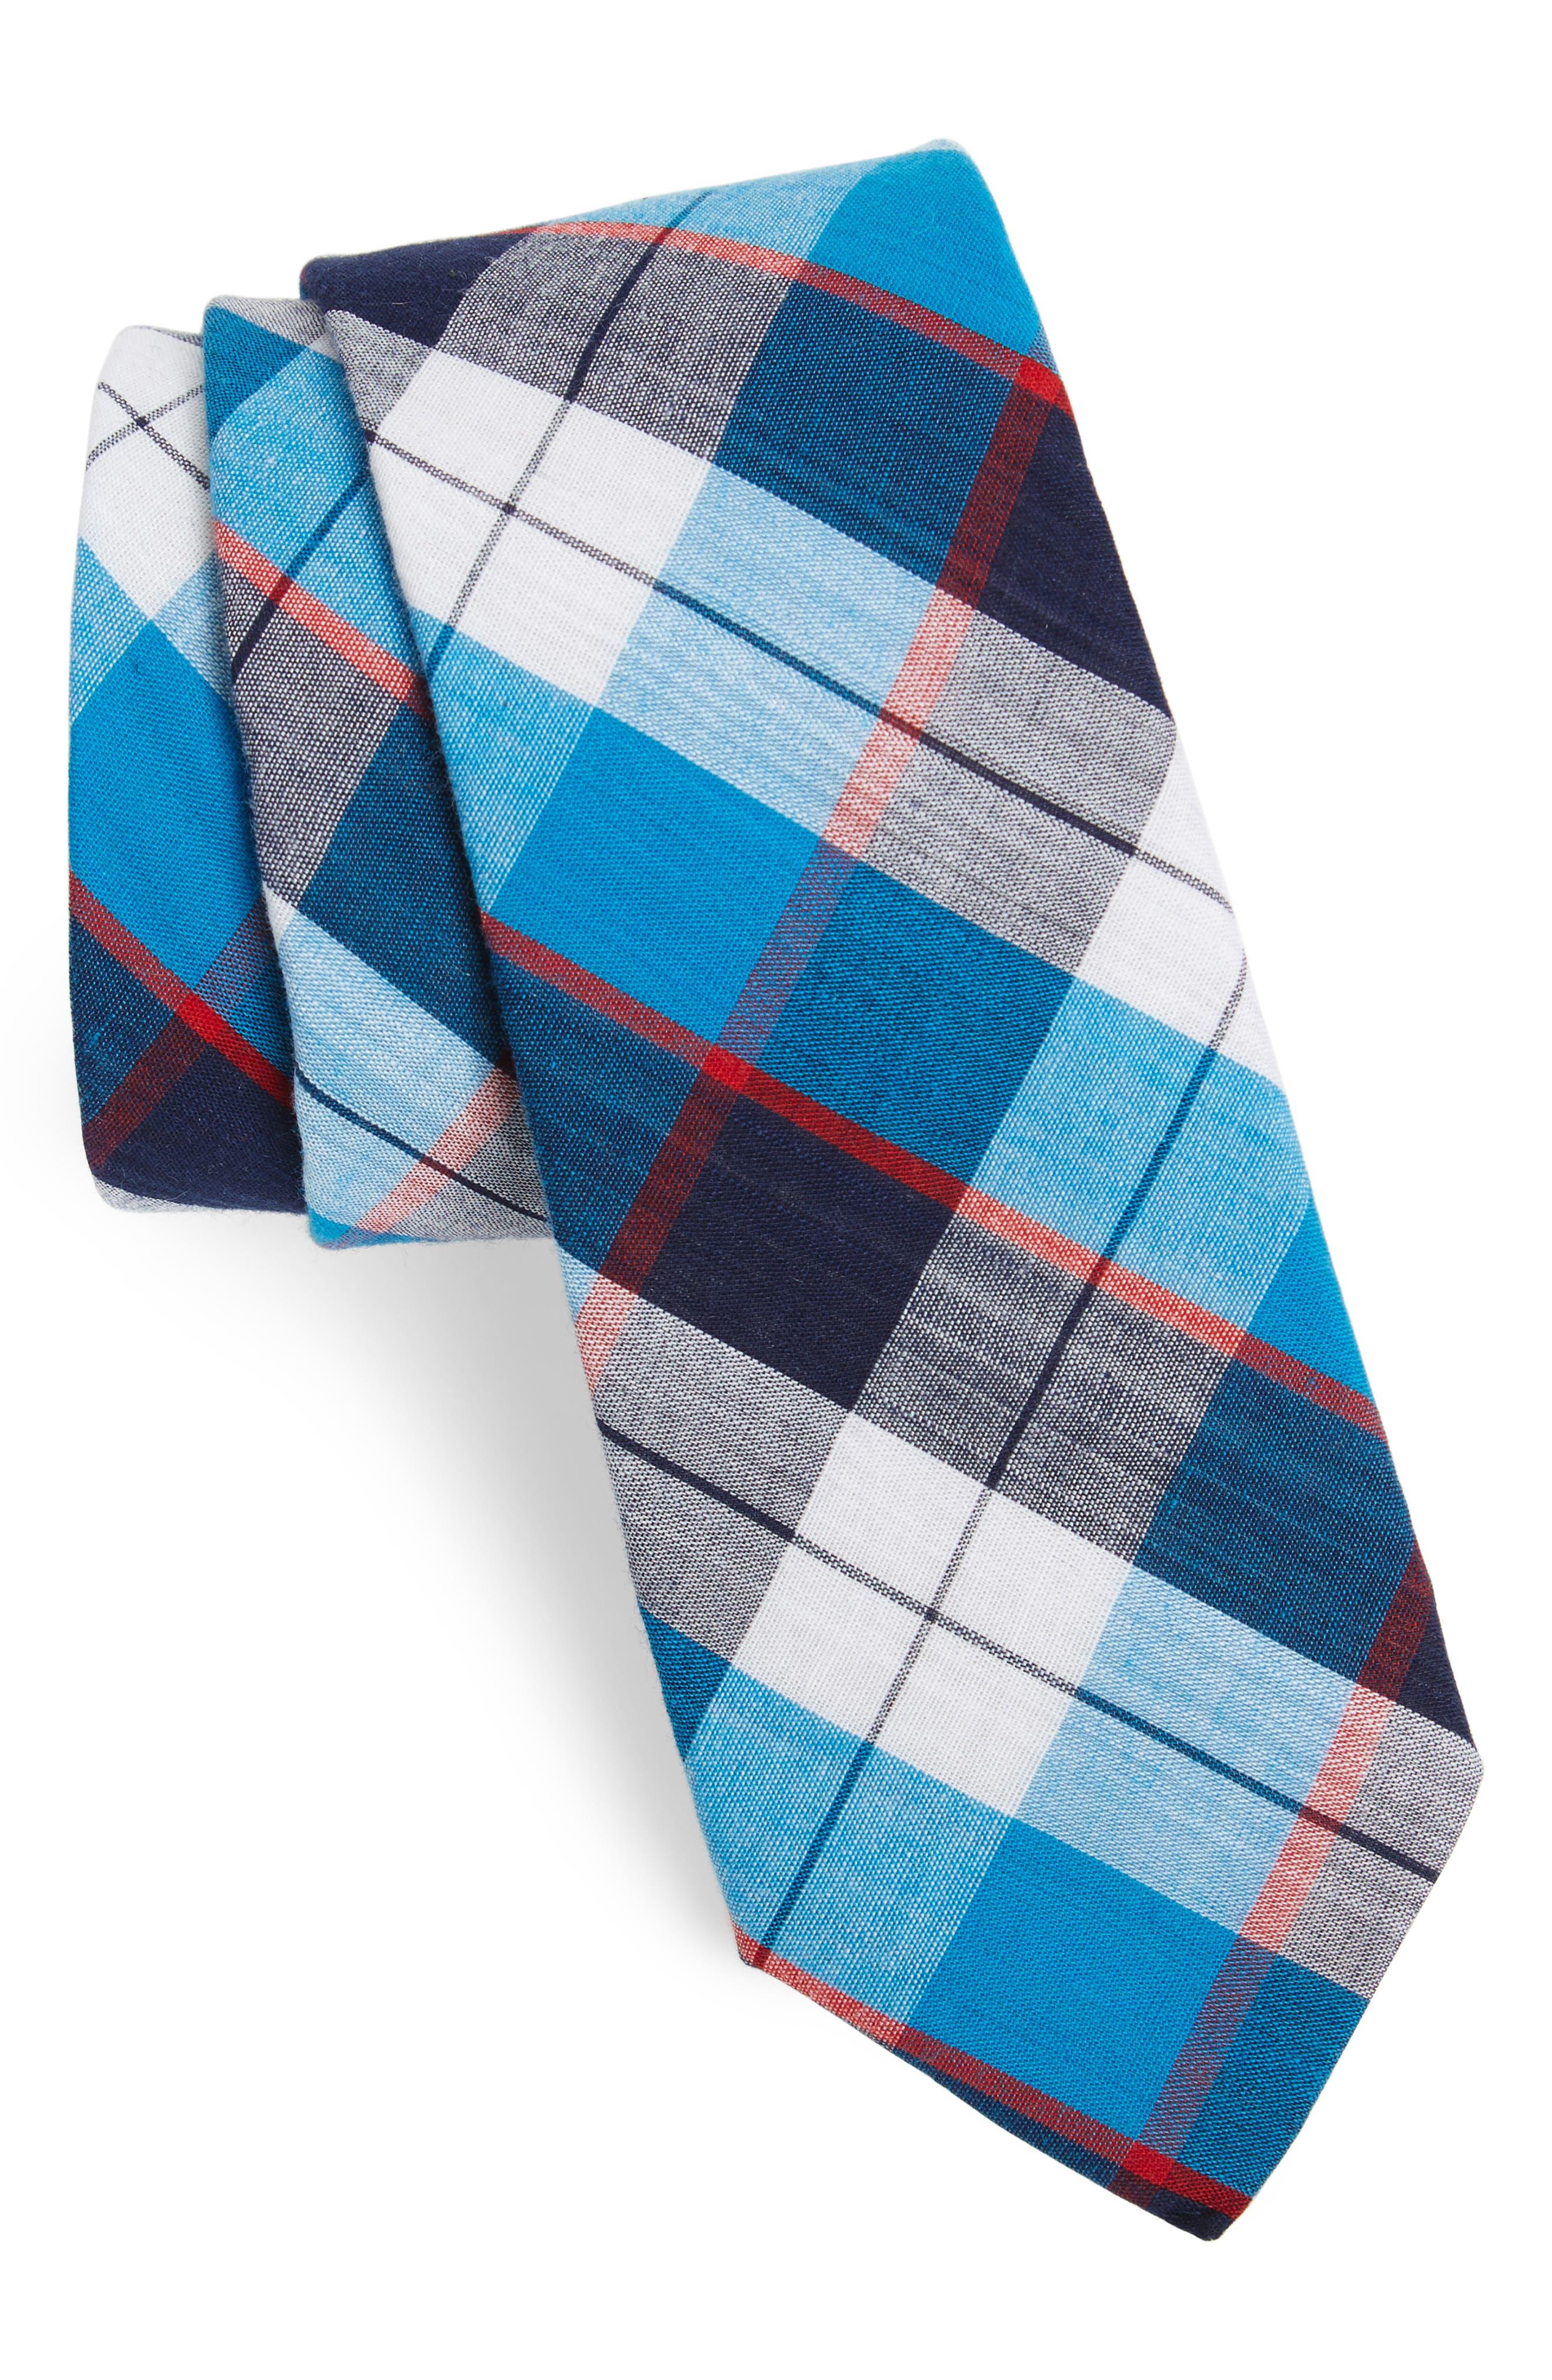 Alternate Image 1 Selected - Nordstrom Men's Shop Esterbrook Plaid Cotton Skinny Tie